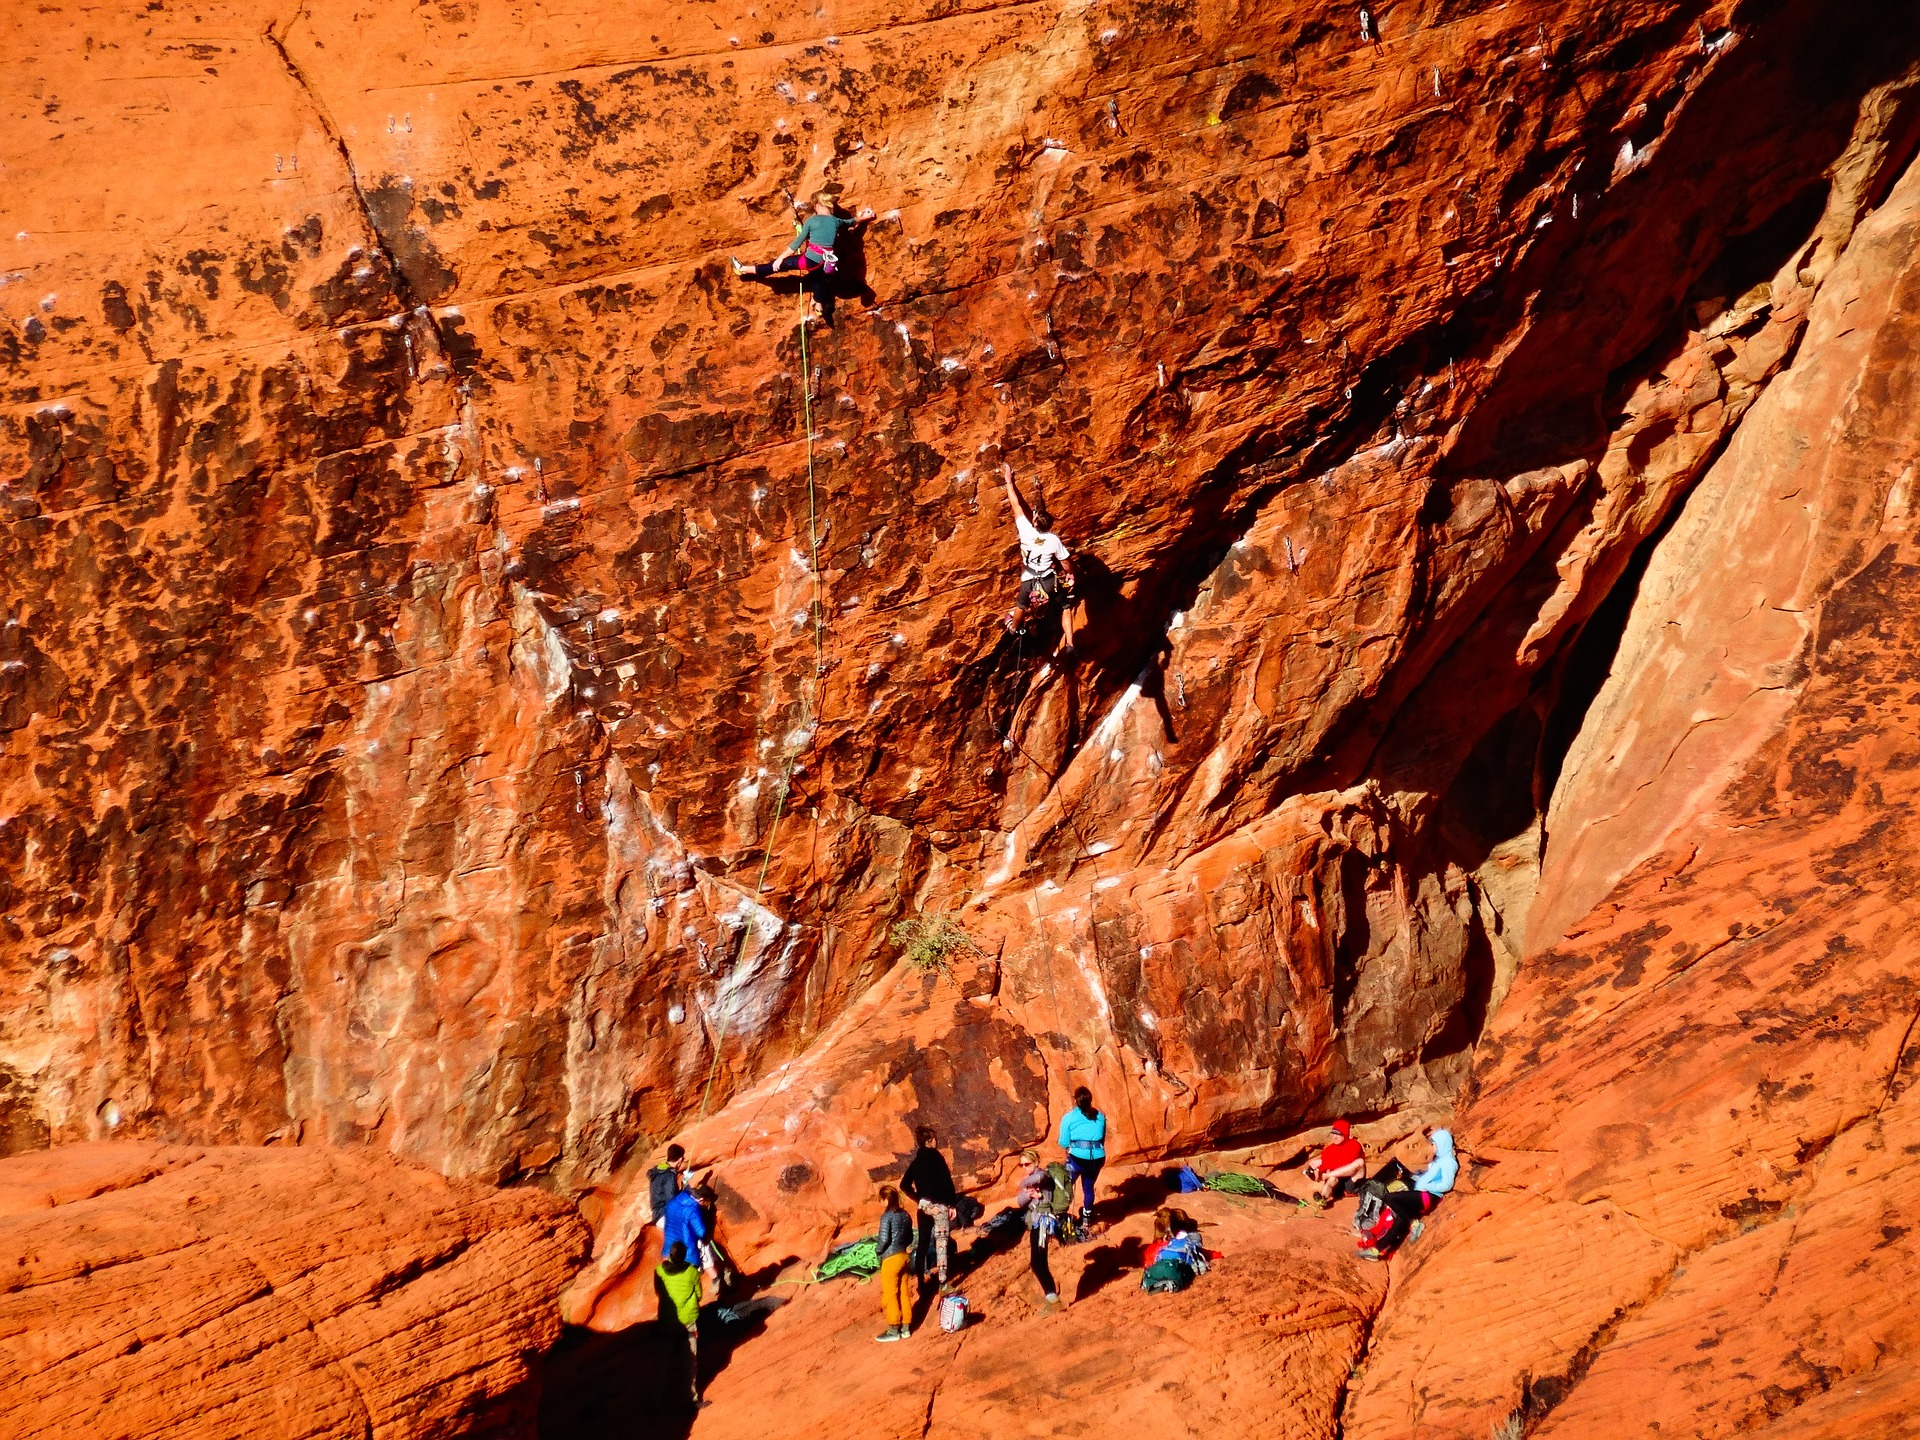 Climbers scale sheer red rocks